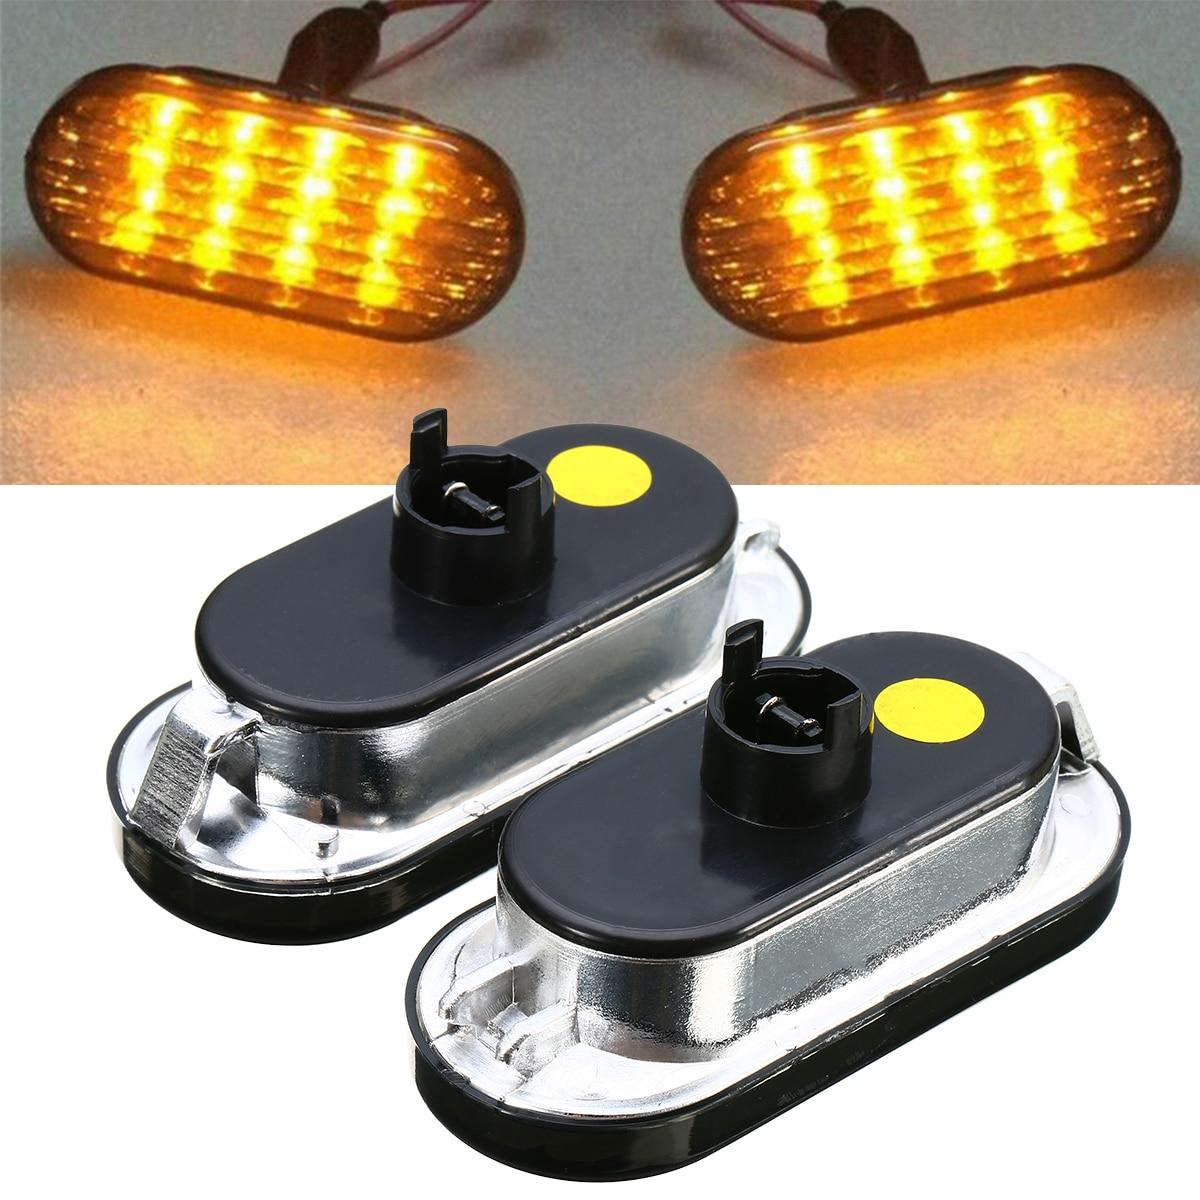 Car Singal Lamp 1Pair Amber LED Side Marker Lights Universal Replacement for V-W G-olf J-etta B-ora MK4 P-assat B5 B5.5